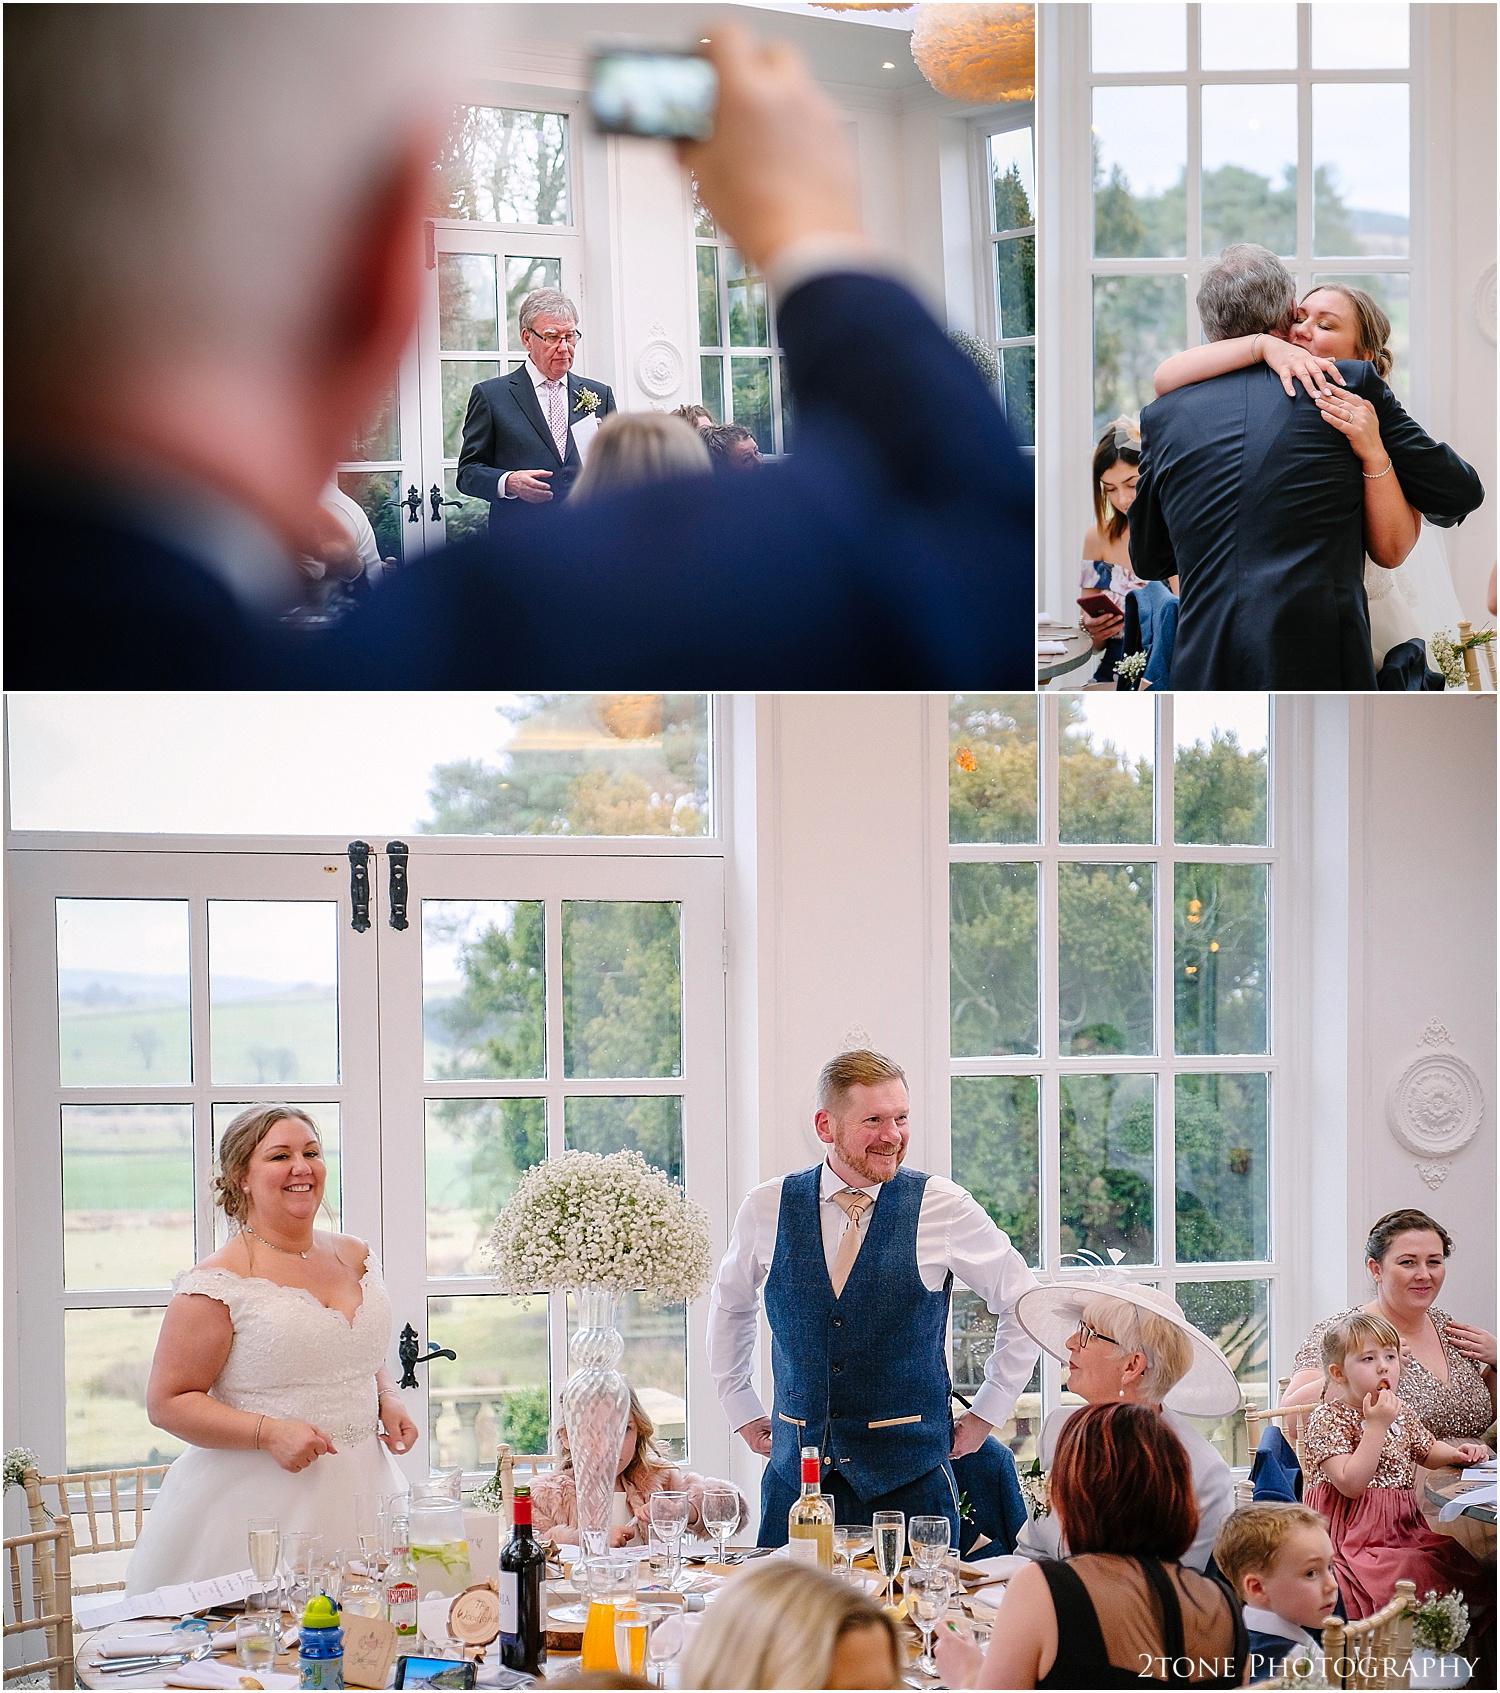 Woodhill Hall wedding photographer 59.jpg